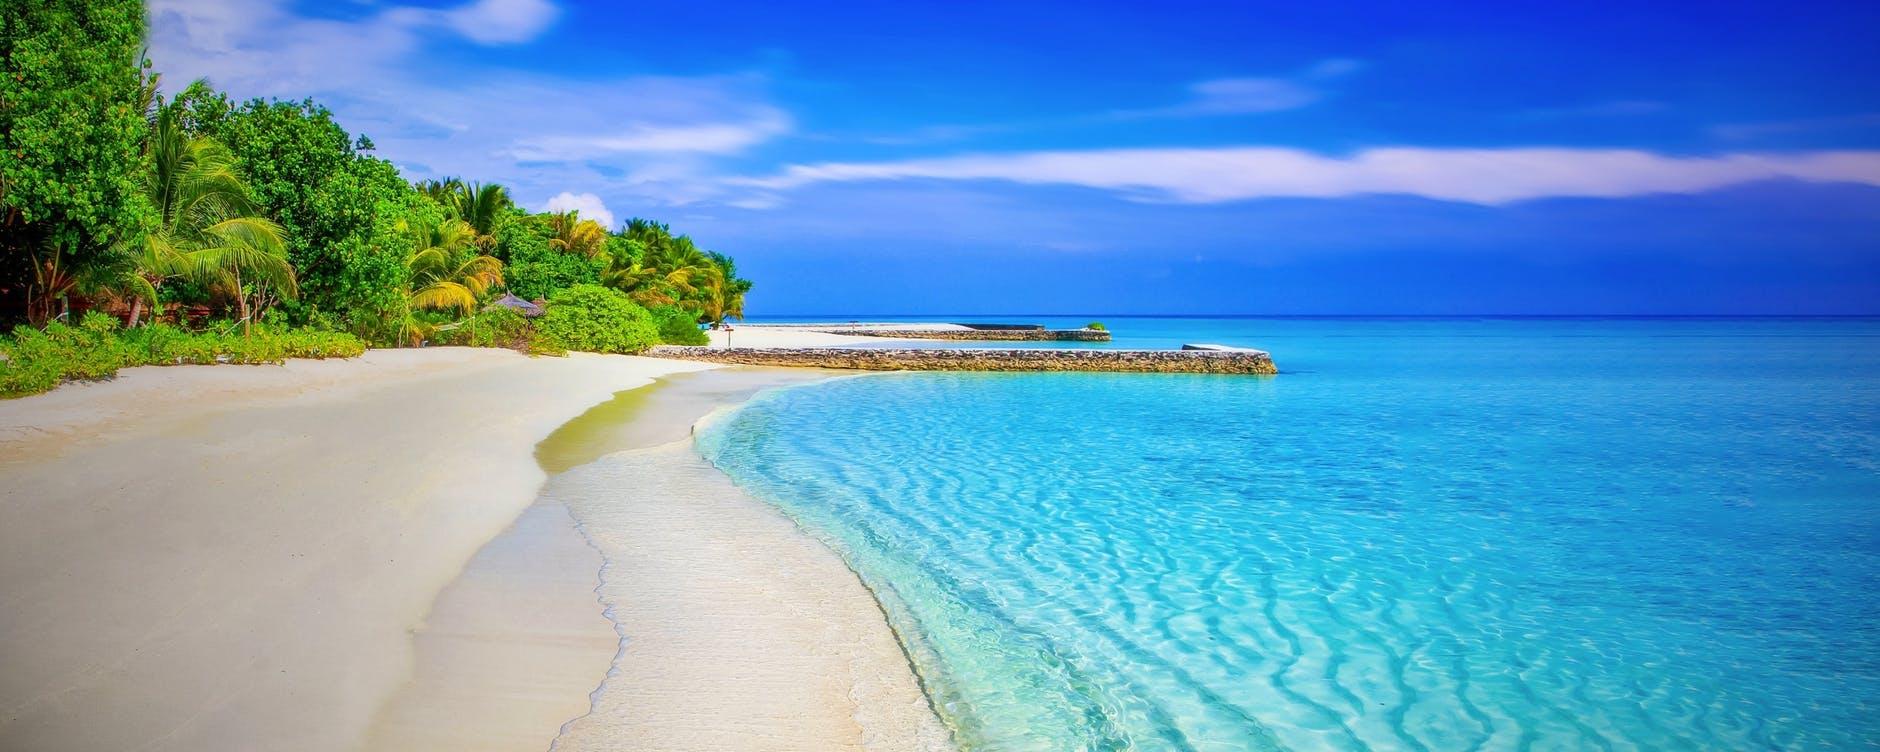 Nice sea Nature Image